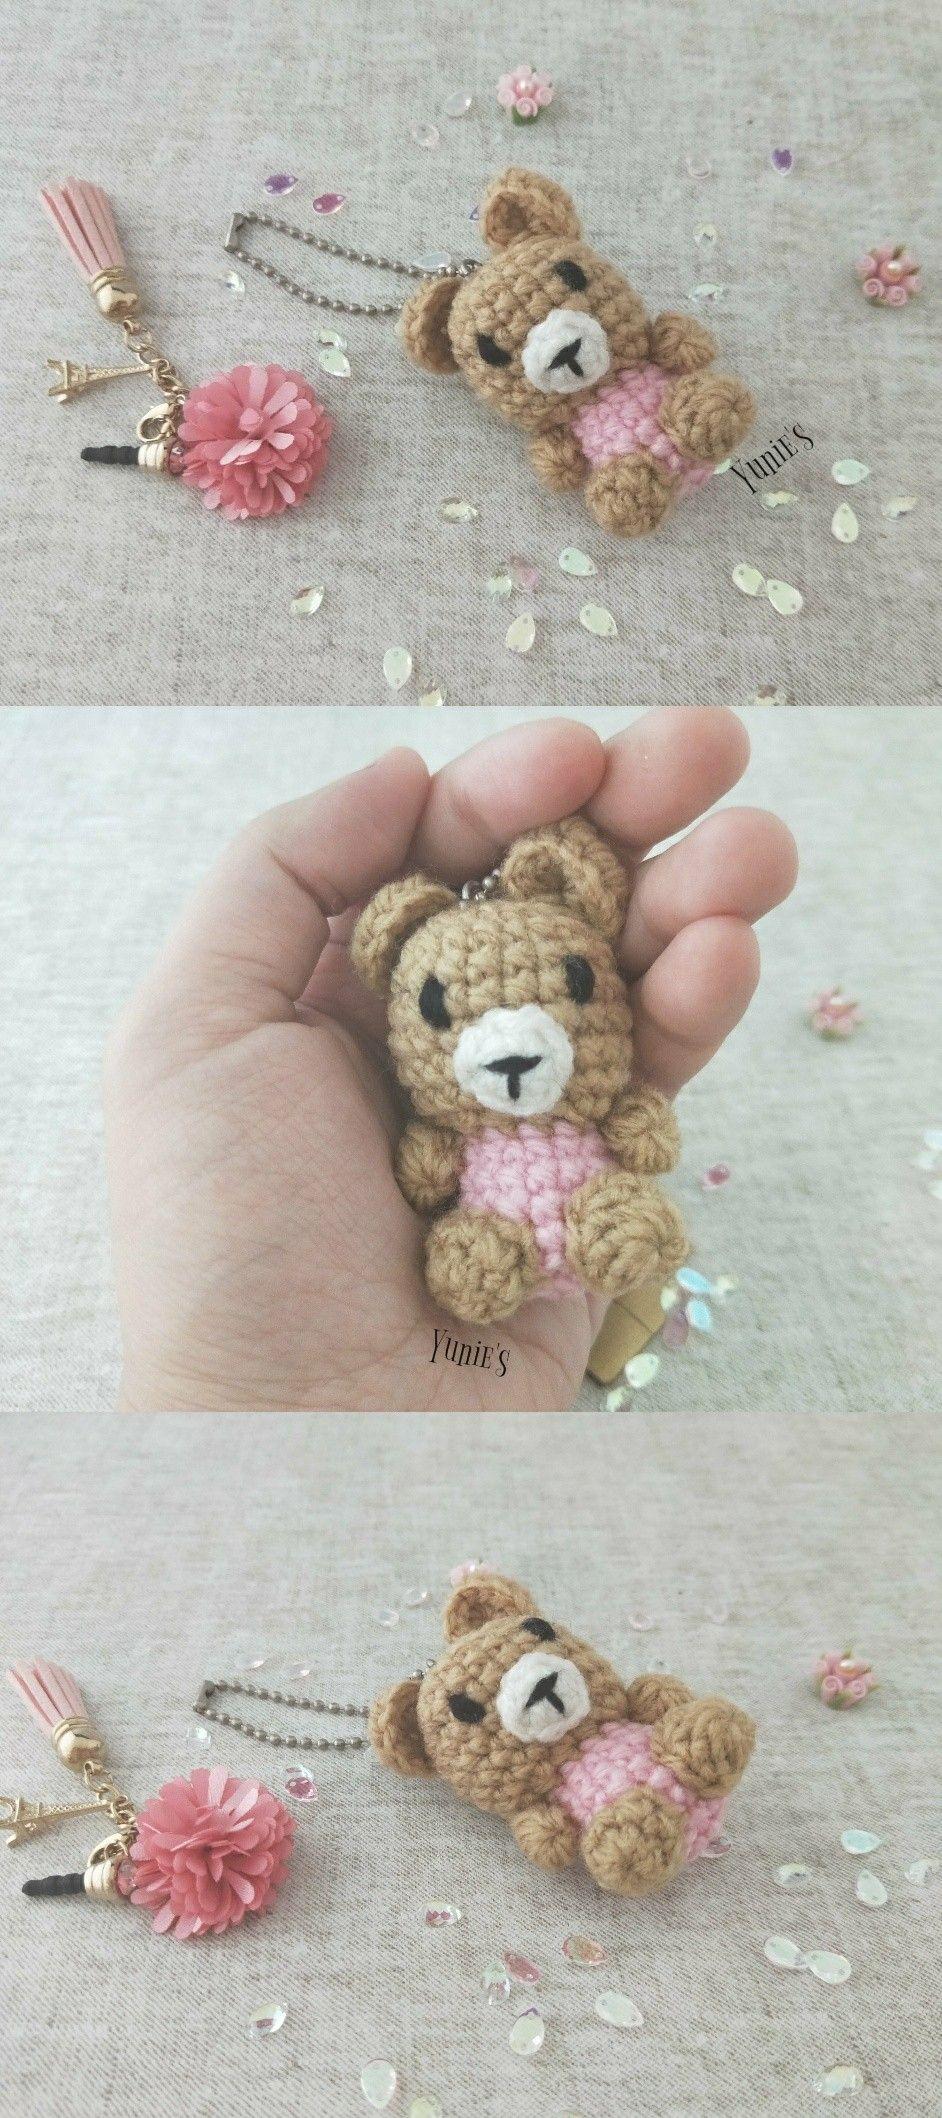 Free Crochet Keychain Pattern - Simply Bear Amigurumi - Crochet News | 2118x942